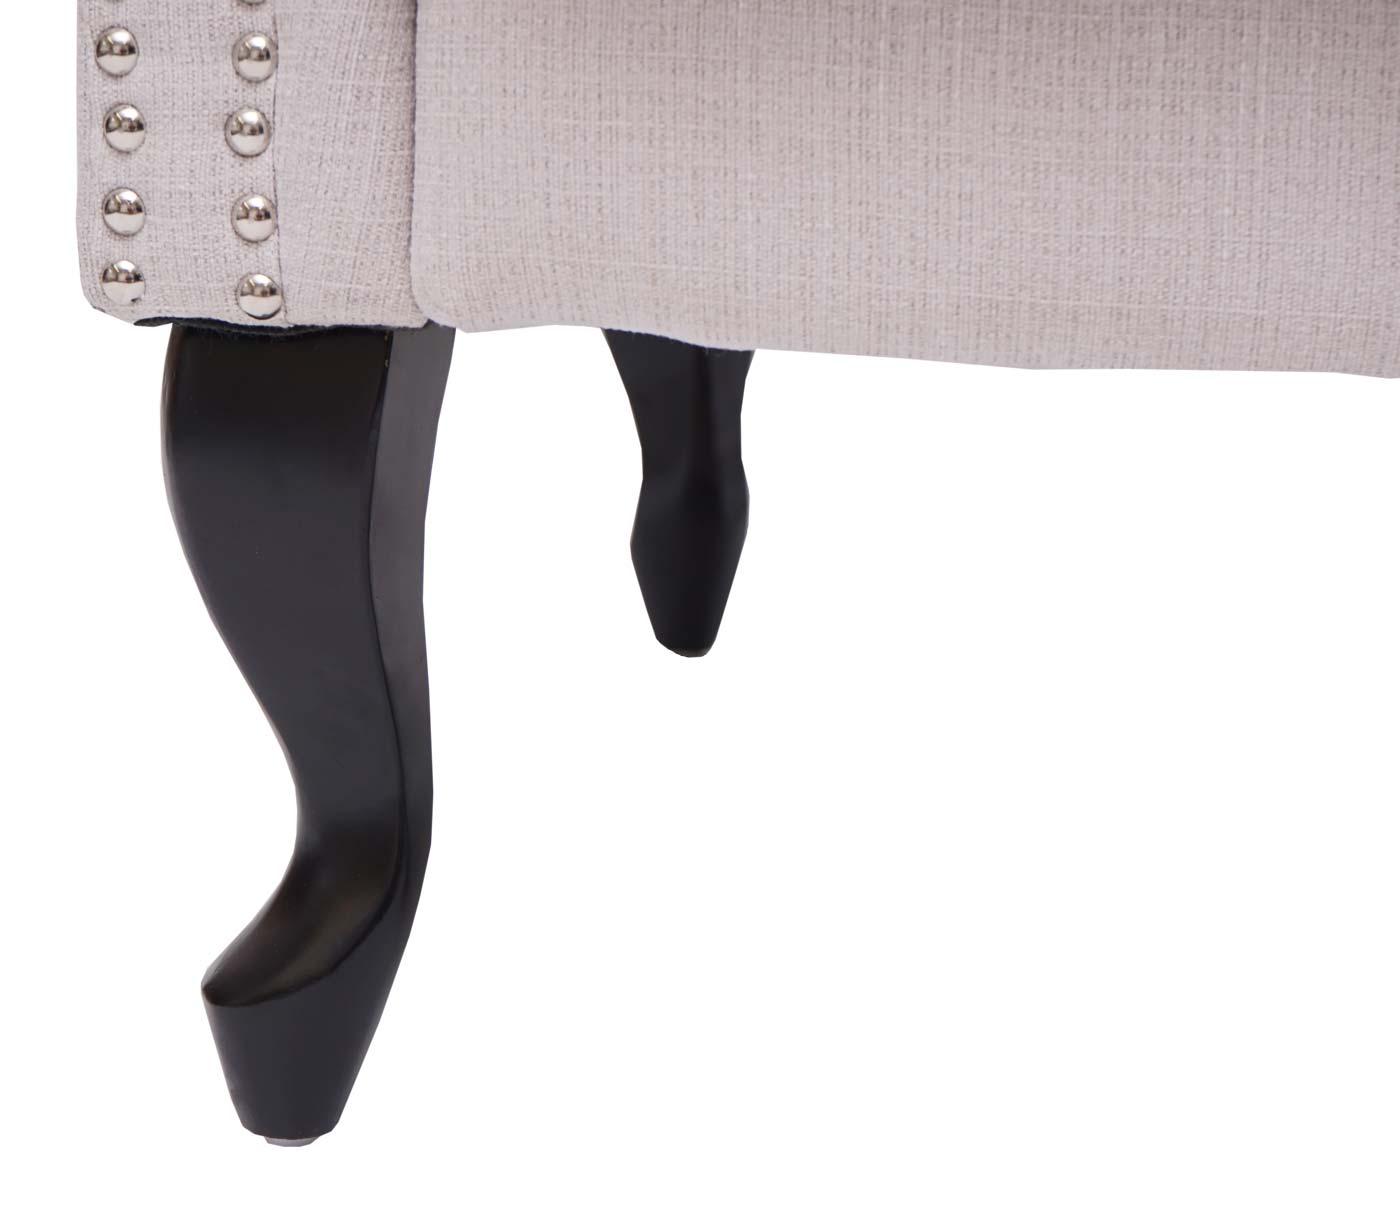 Chesterfield Ottomane Detailbild Fuß